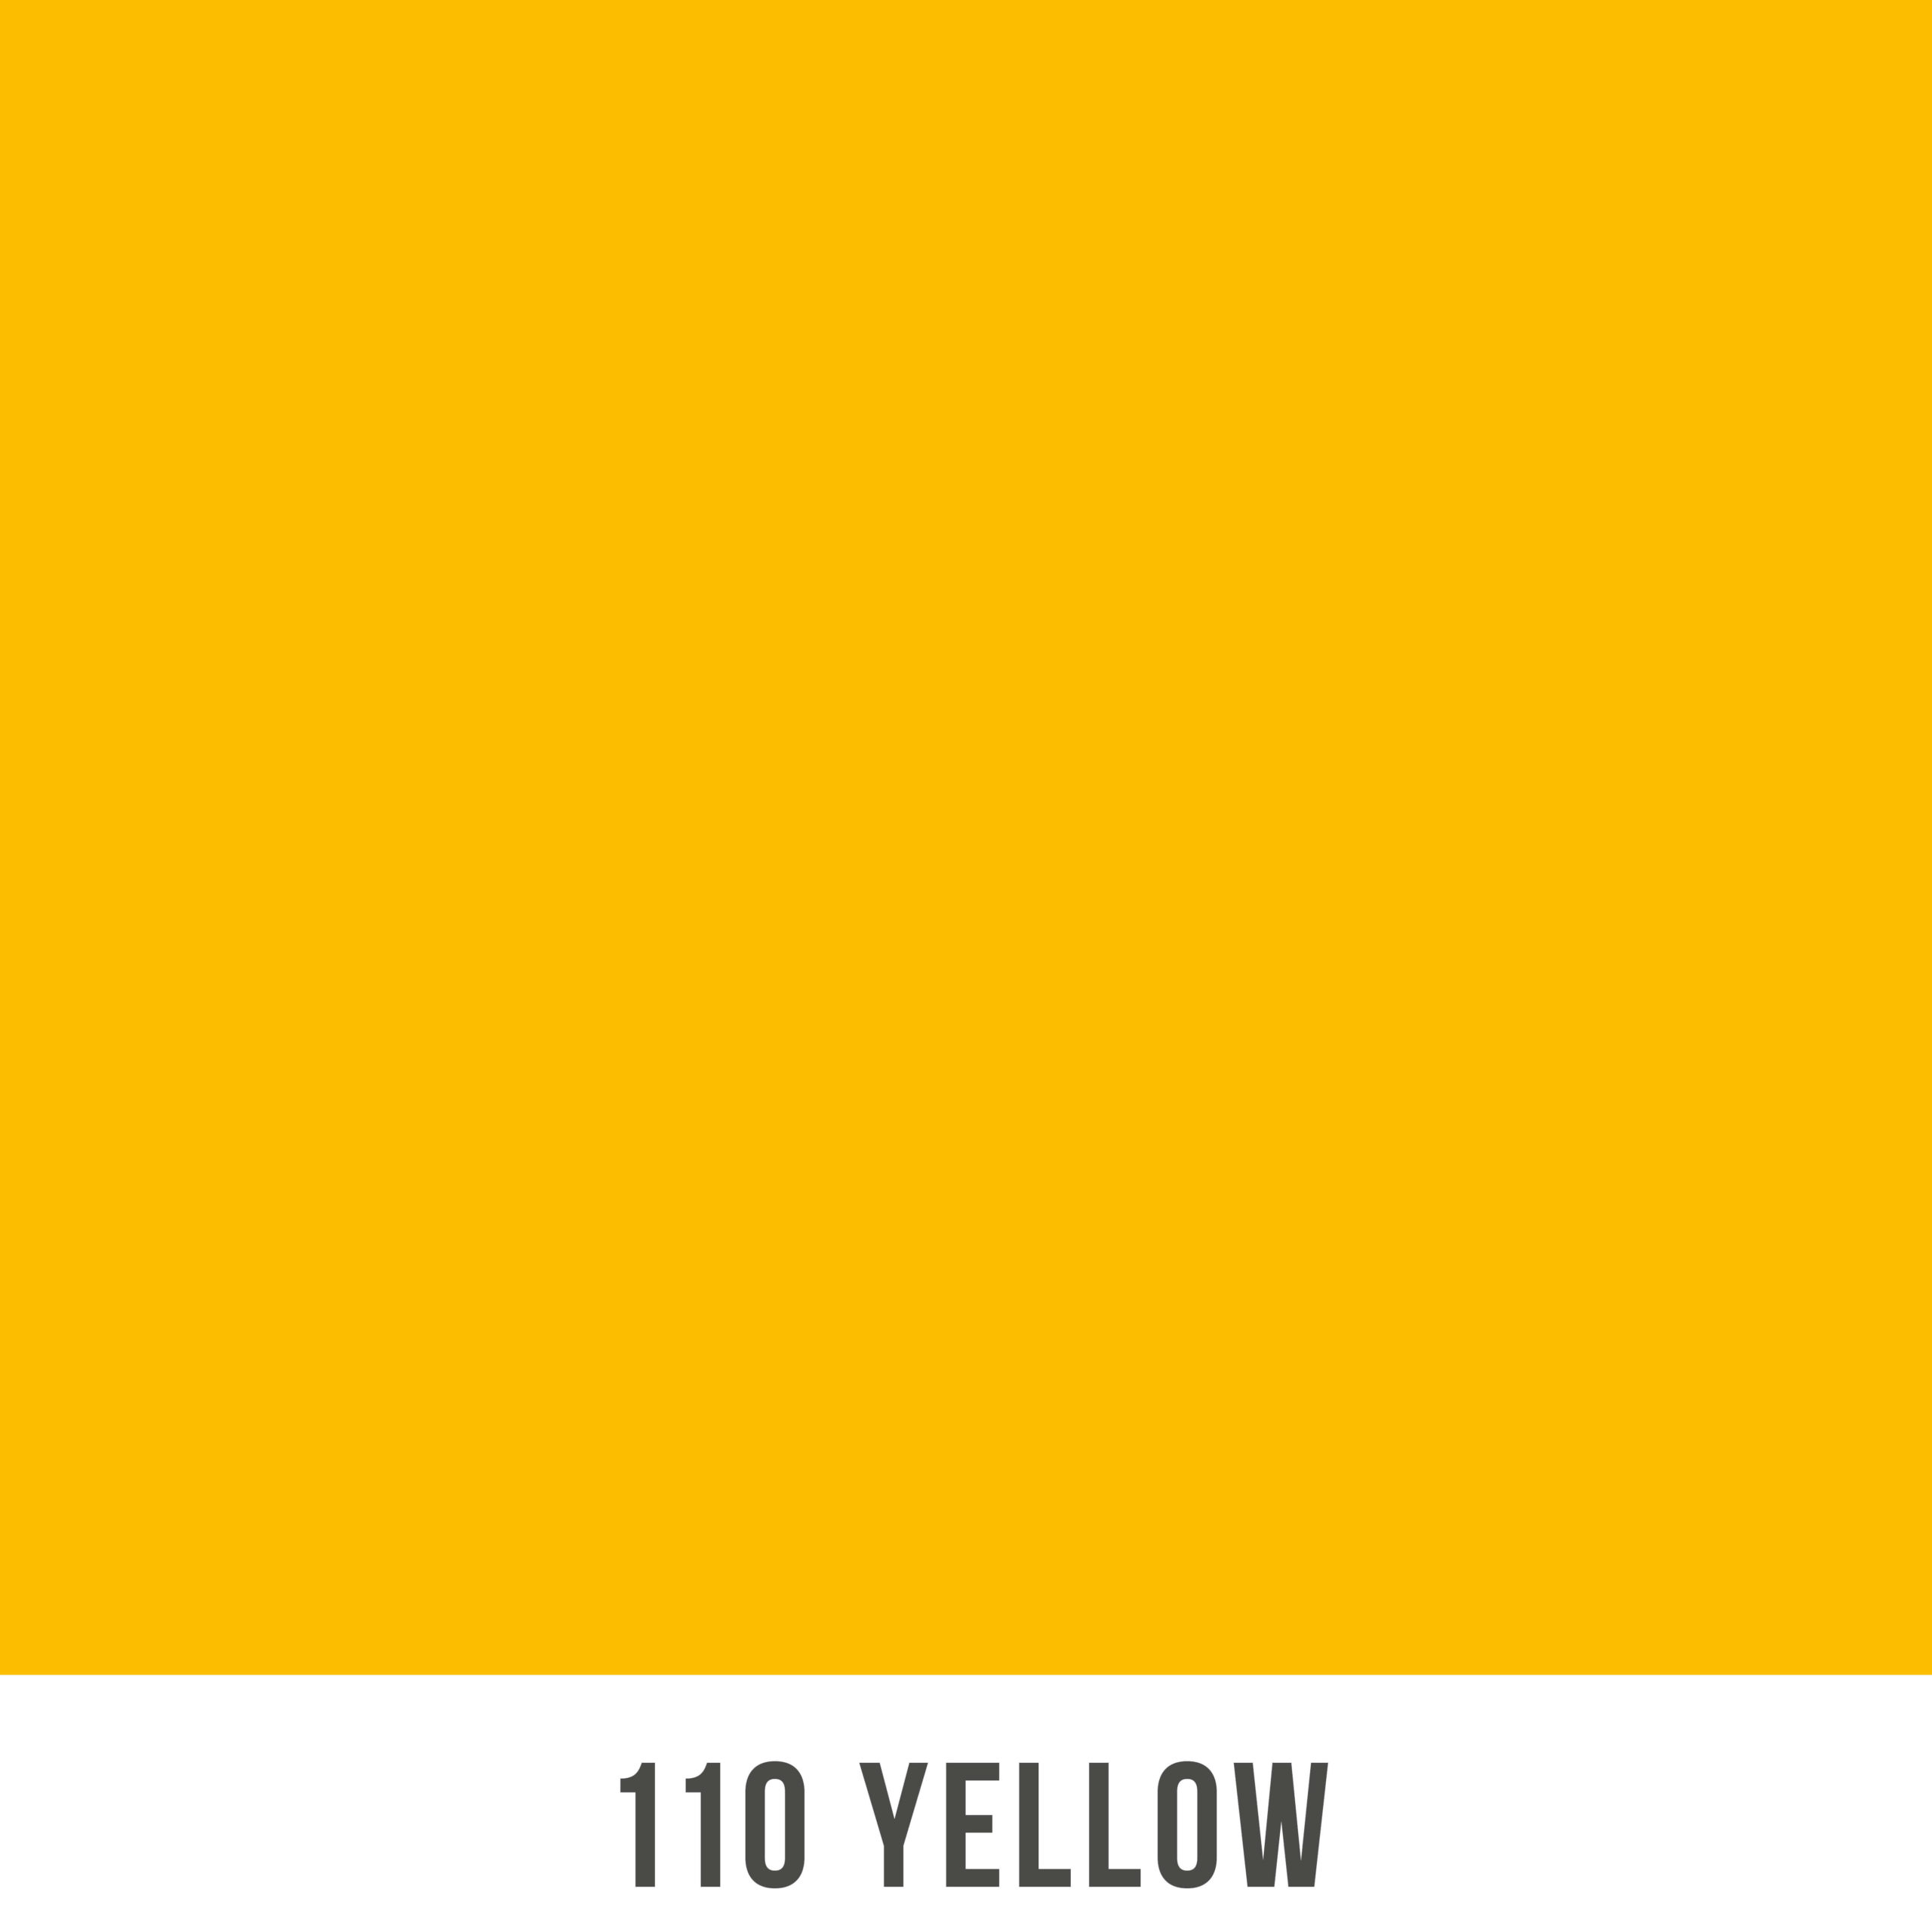 110 scaled